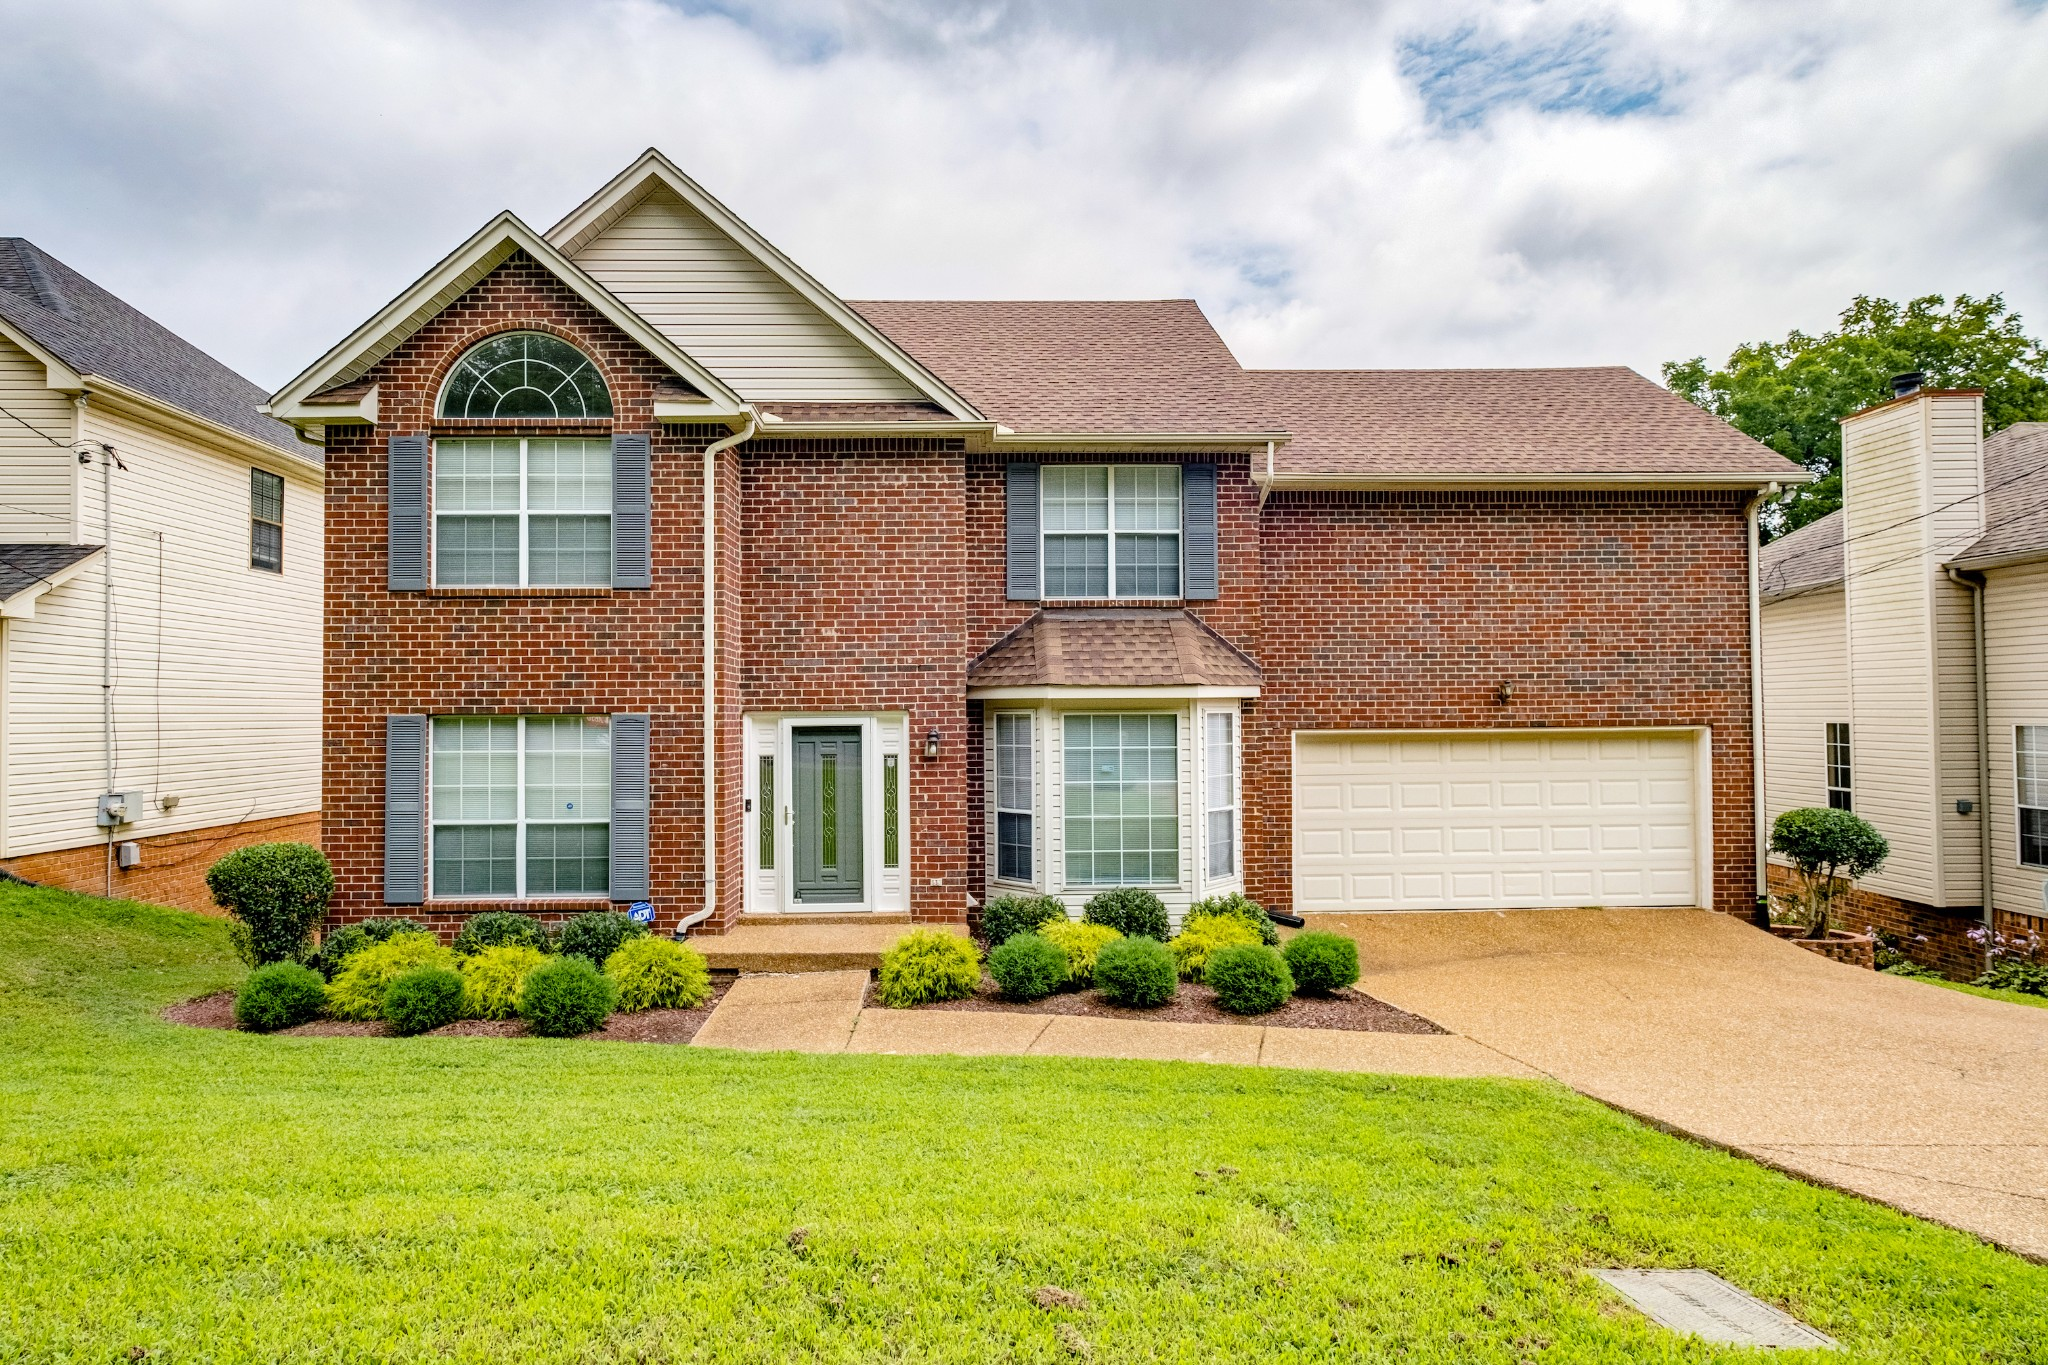 3209 Cobble St Property Photo - Nashville, TN real estate listing